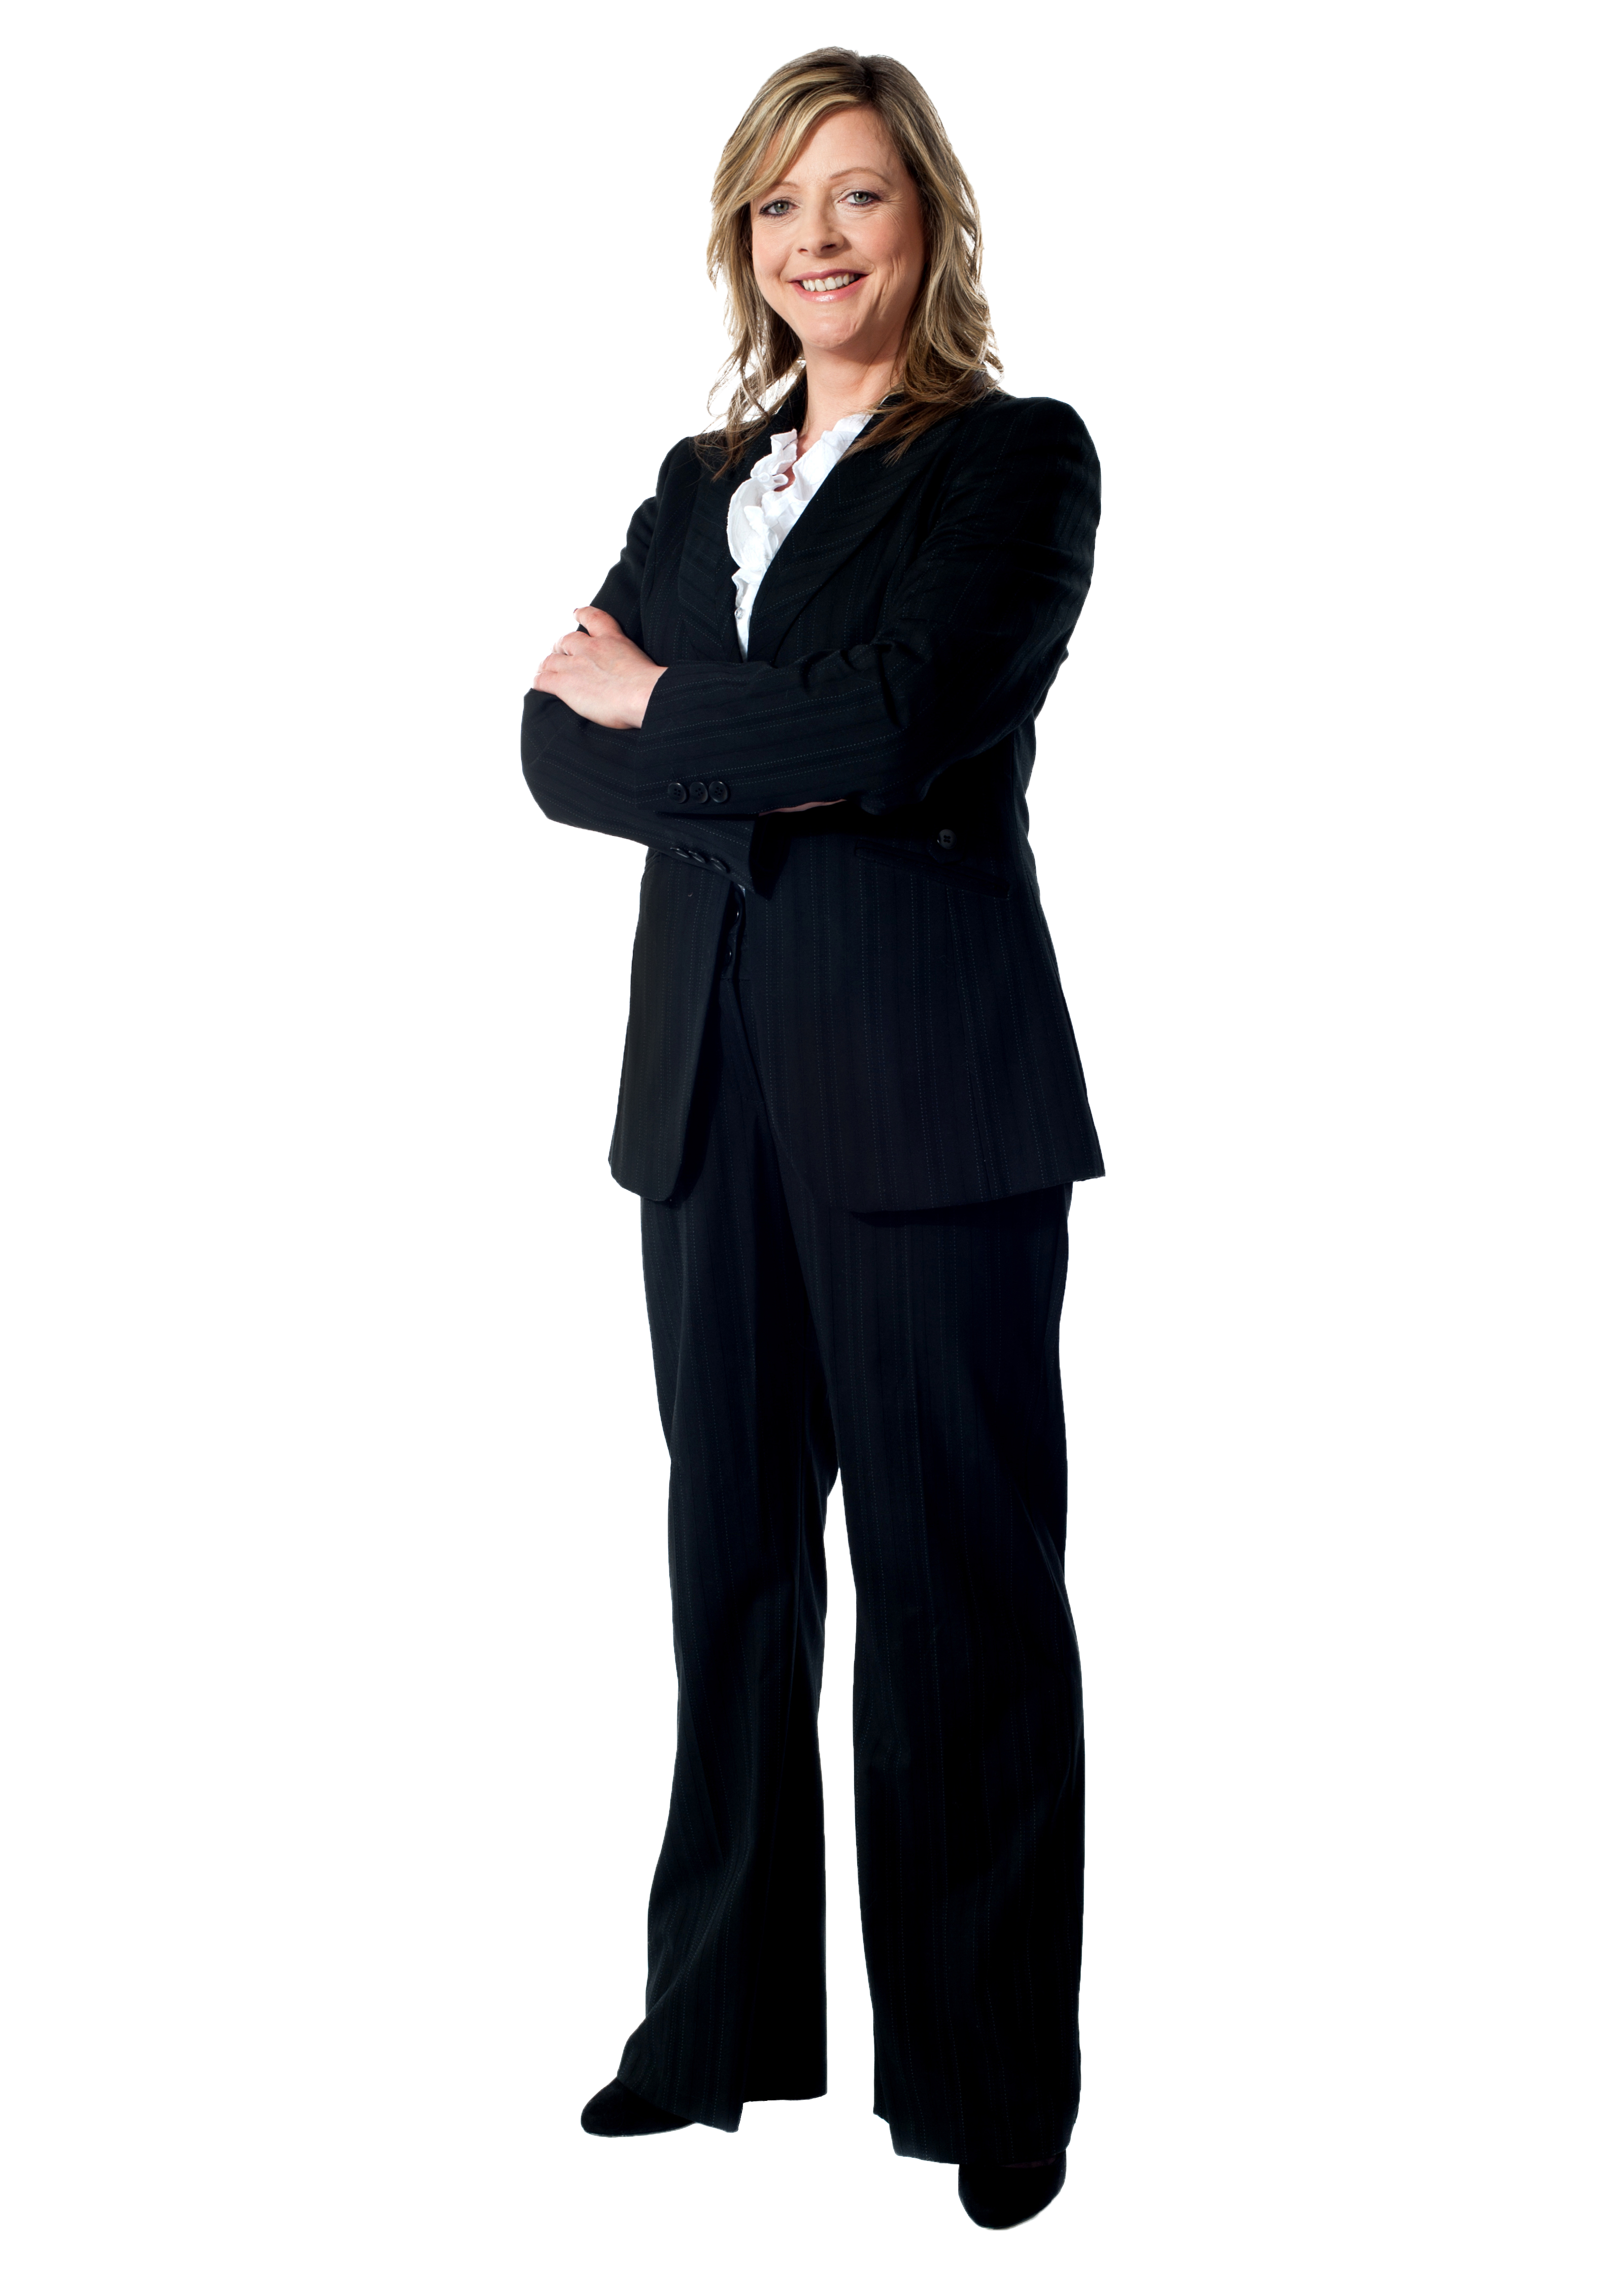 Business Women Png Image Business Women Woman Standing Women